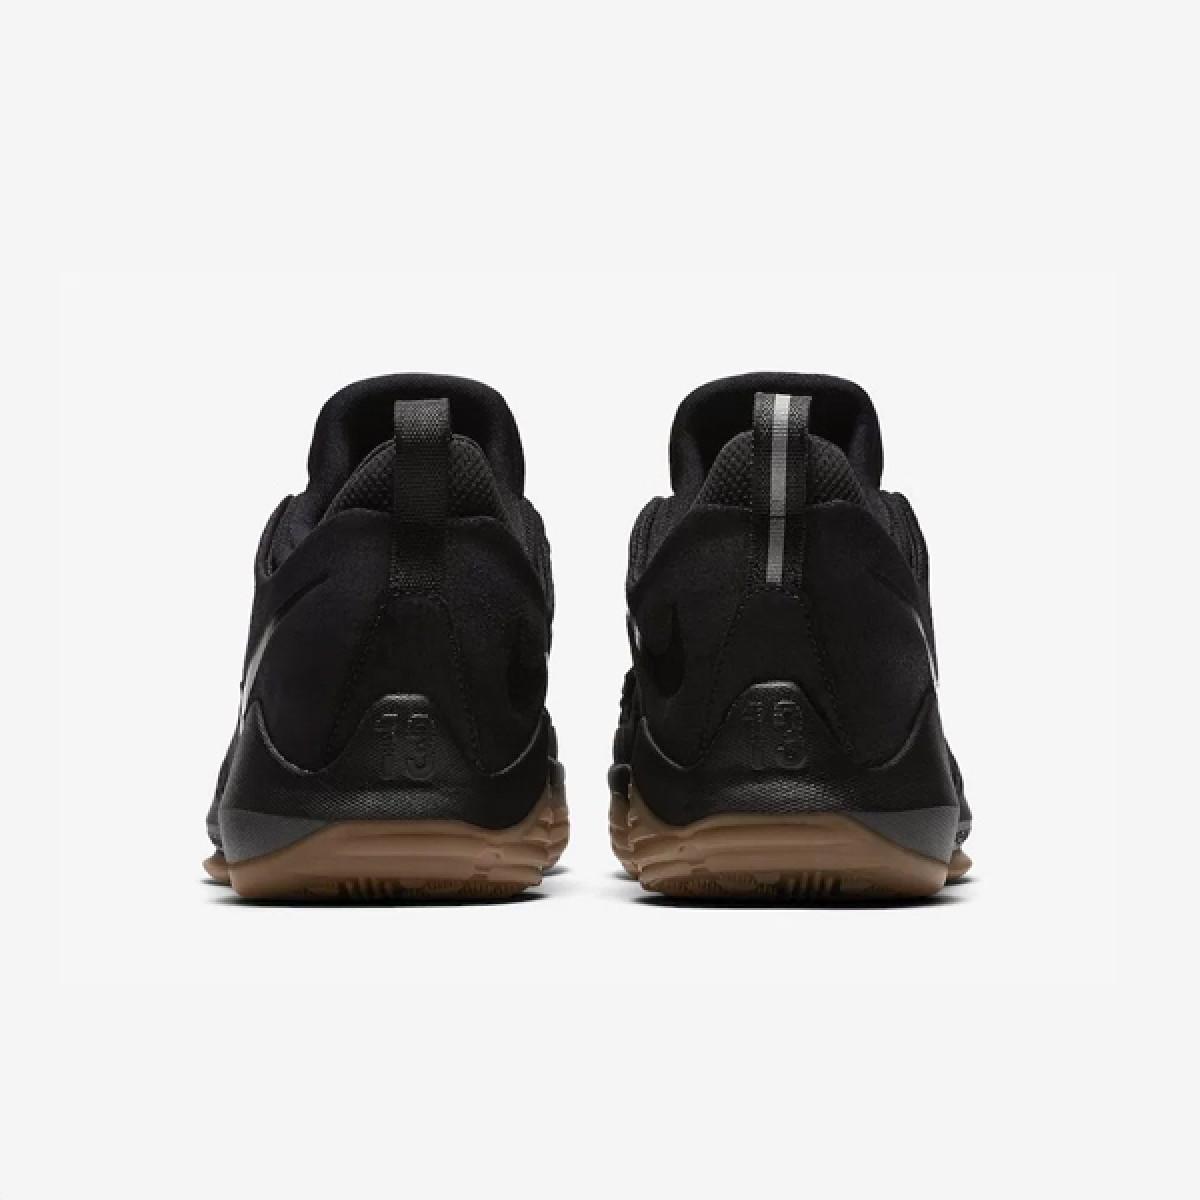 Nike PG 1 'Black Gum' 878627-004